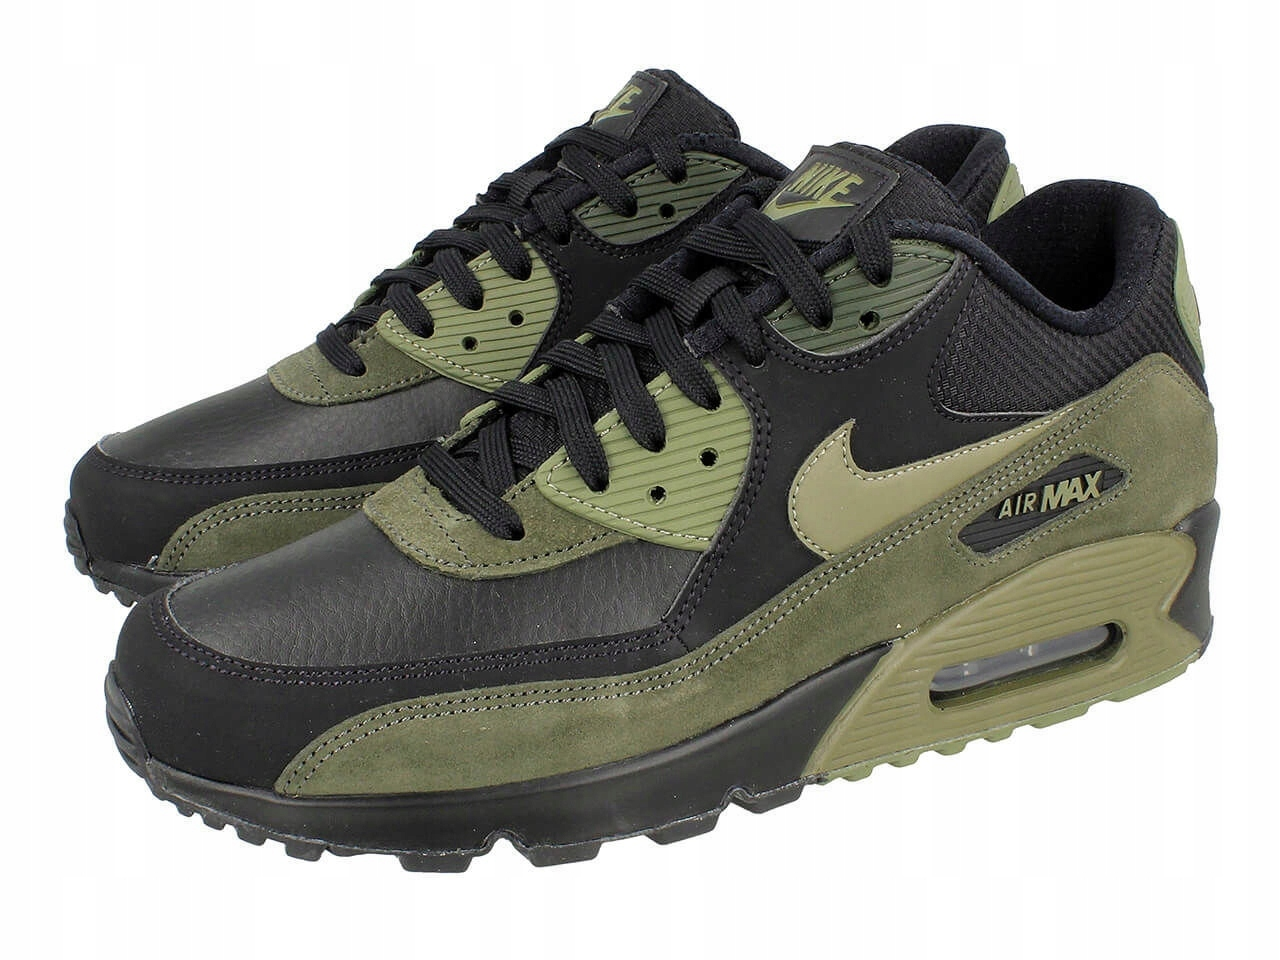 8f95ced4787 Nike Air Max 90 Leather 302519-014 # 45,5 - 7600263149 - oficjalne ...